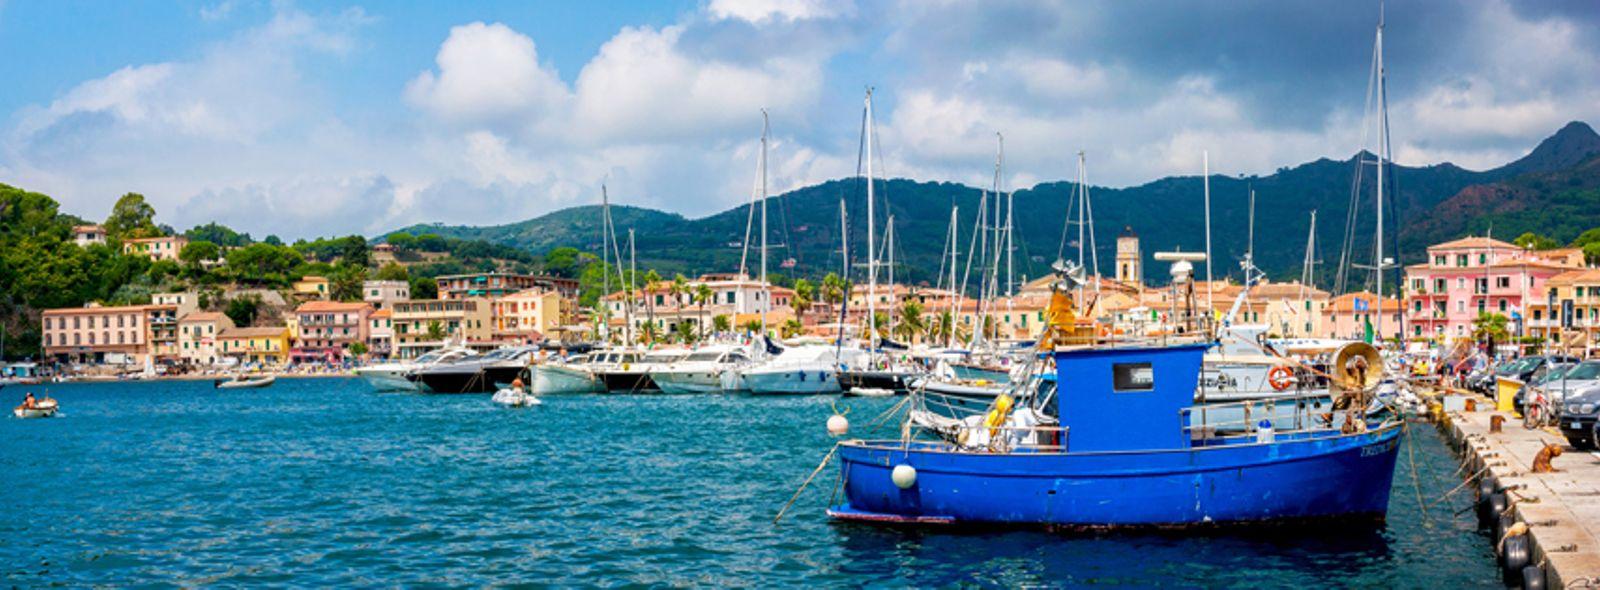 Isola d'Elba cosa vedere